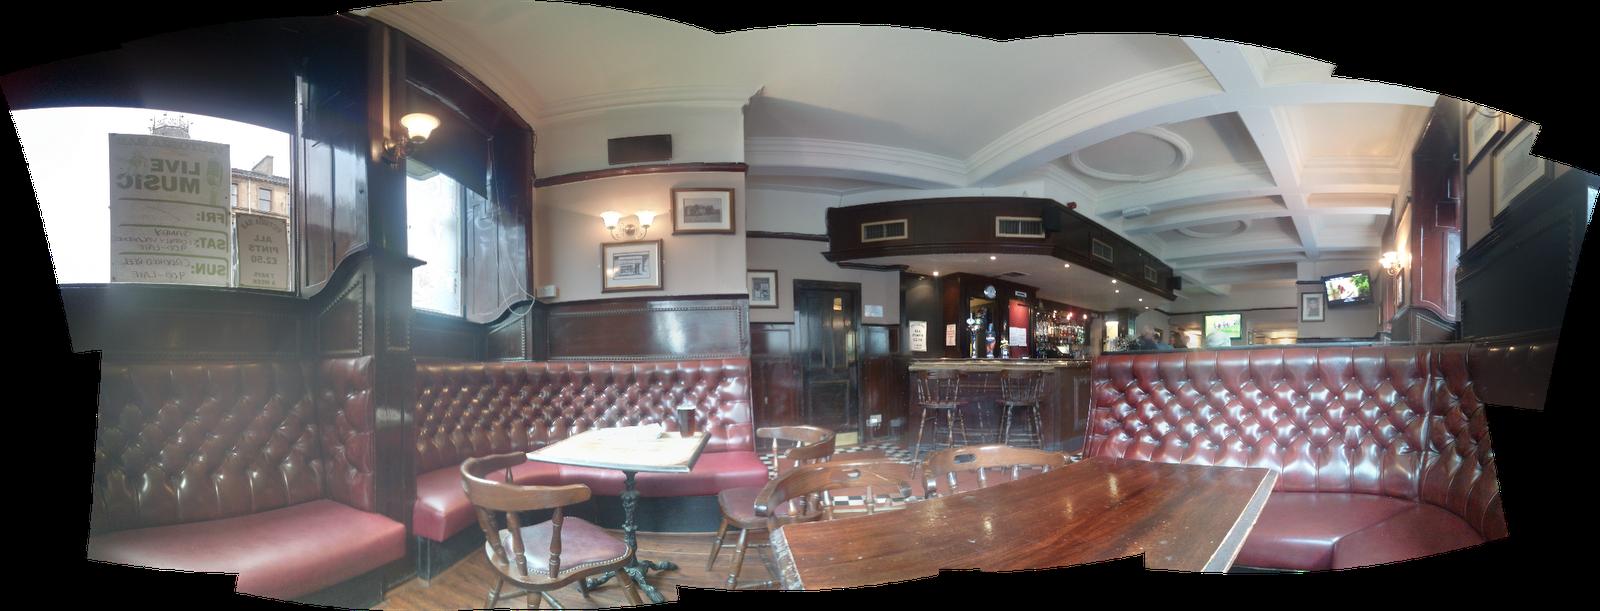 Victoria Bar, Glasgow